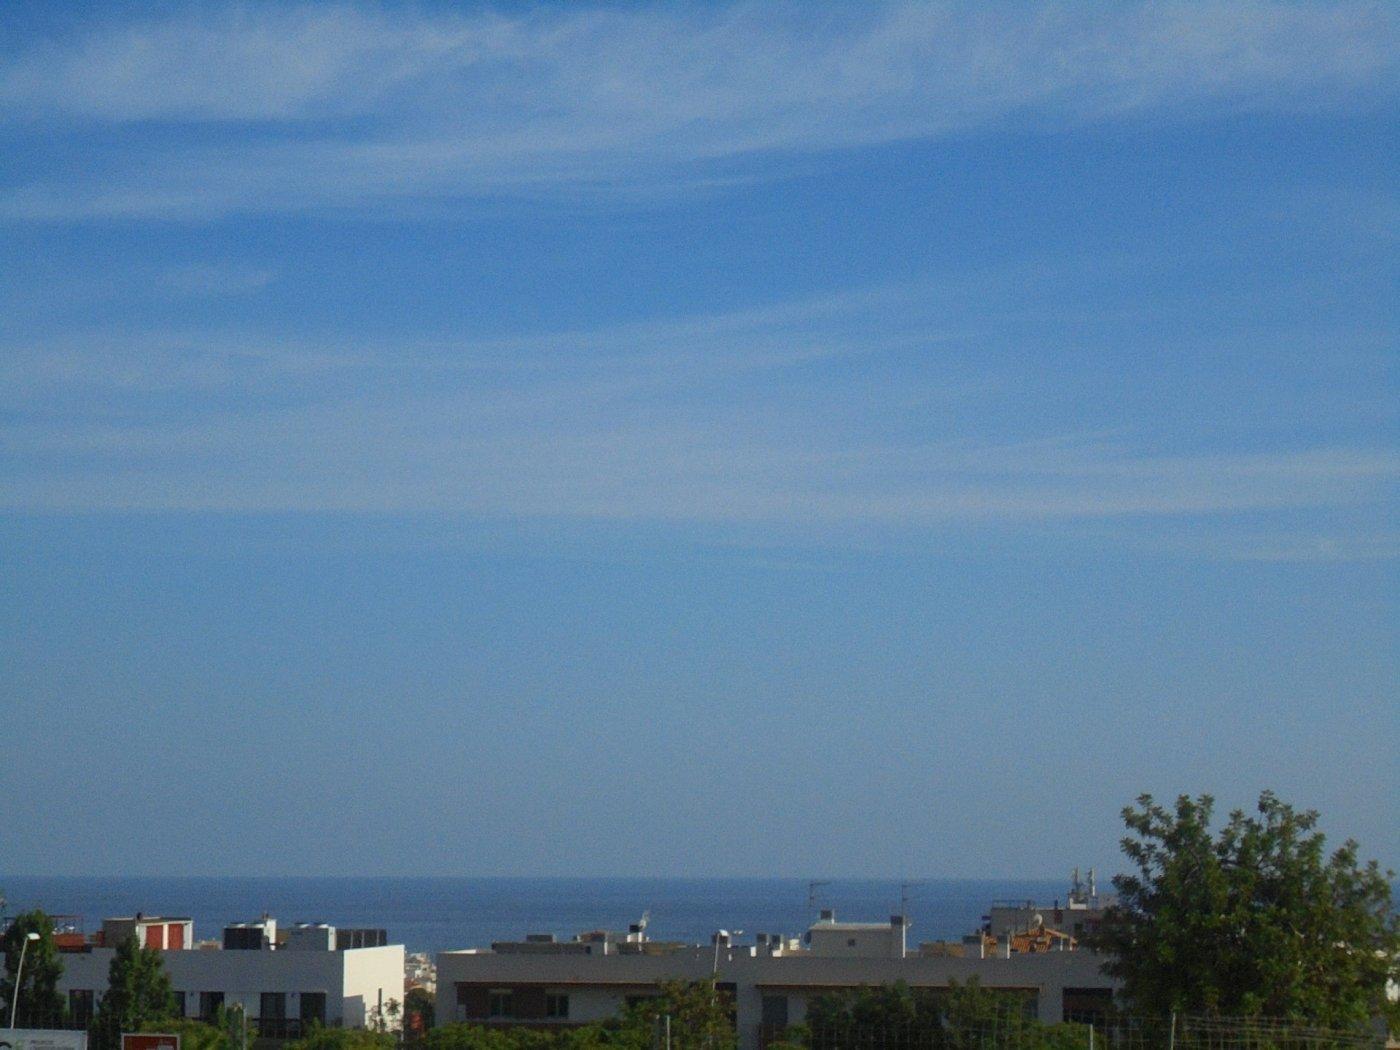 Land for sale in Poble sec/observatori, Sitges